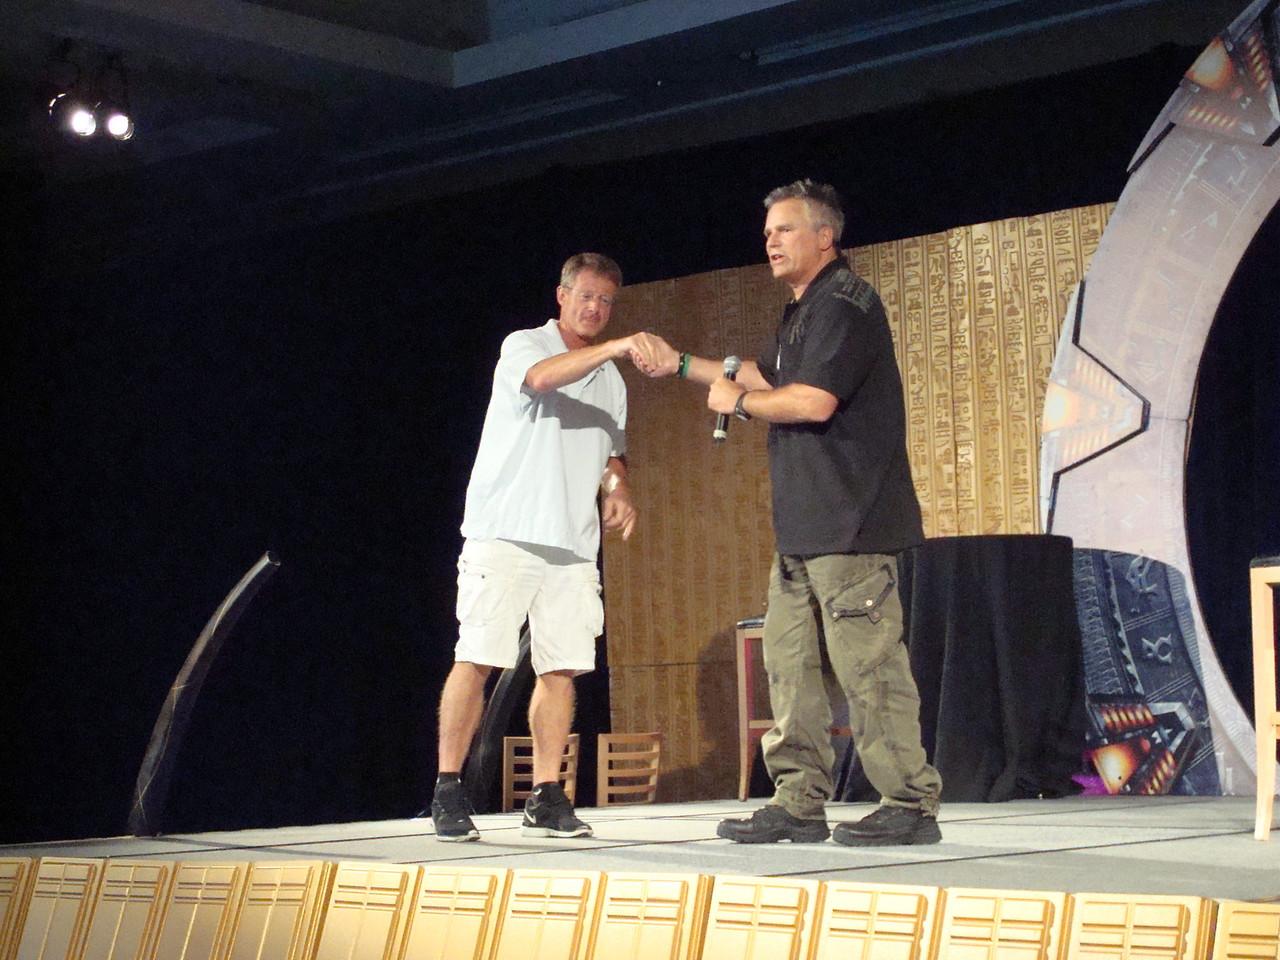 Dan Shea (Sgt. Siler and stunt guru), Richard Dean Anderson